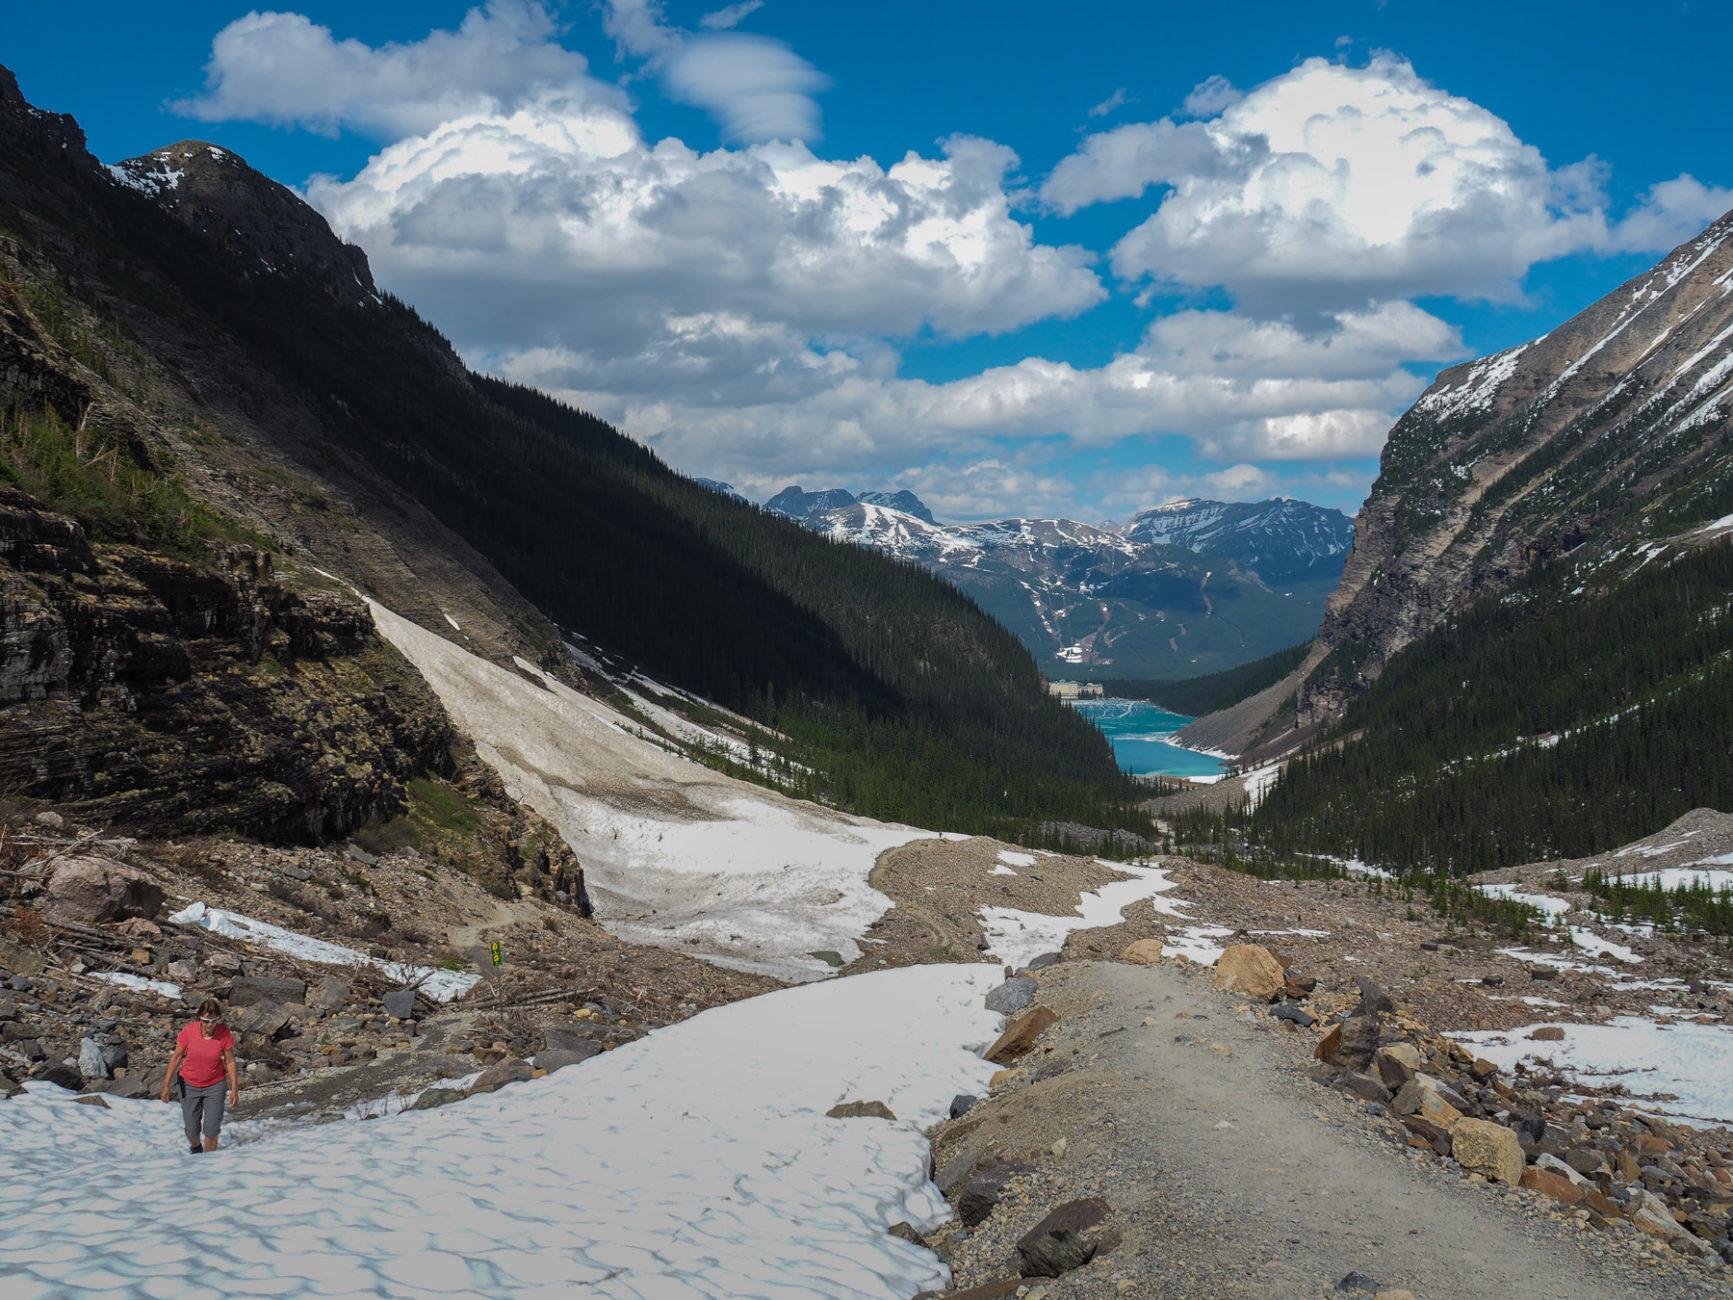 Wanderung zum Plain of six Glaciers